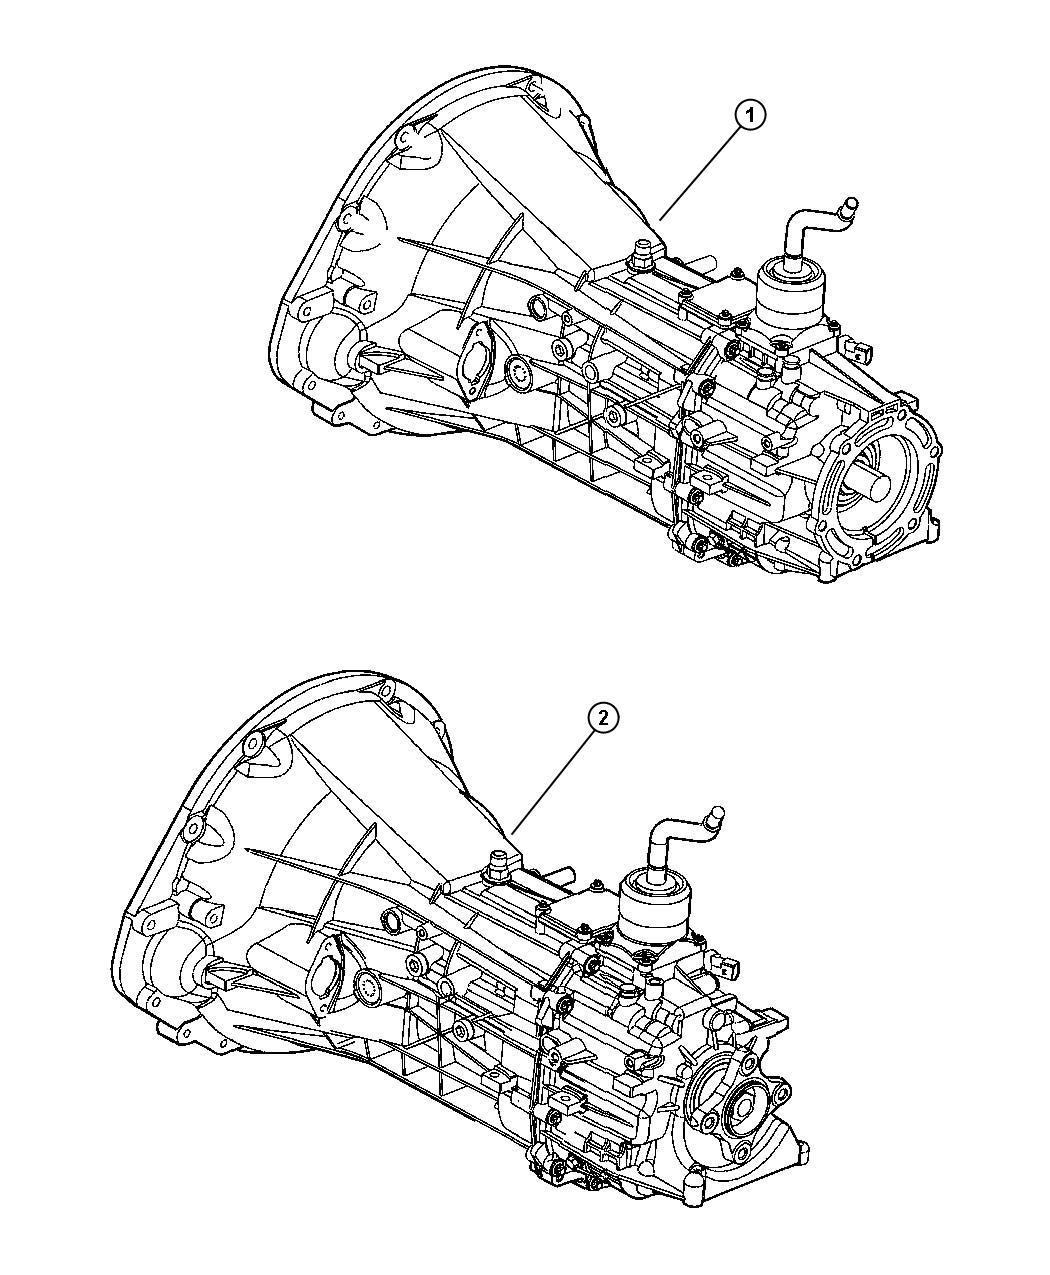 Dodge Dakota Trans. 6 speed. 2wd. Transmission, assembly